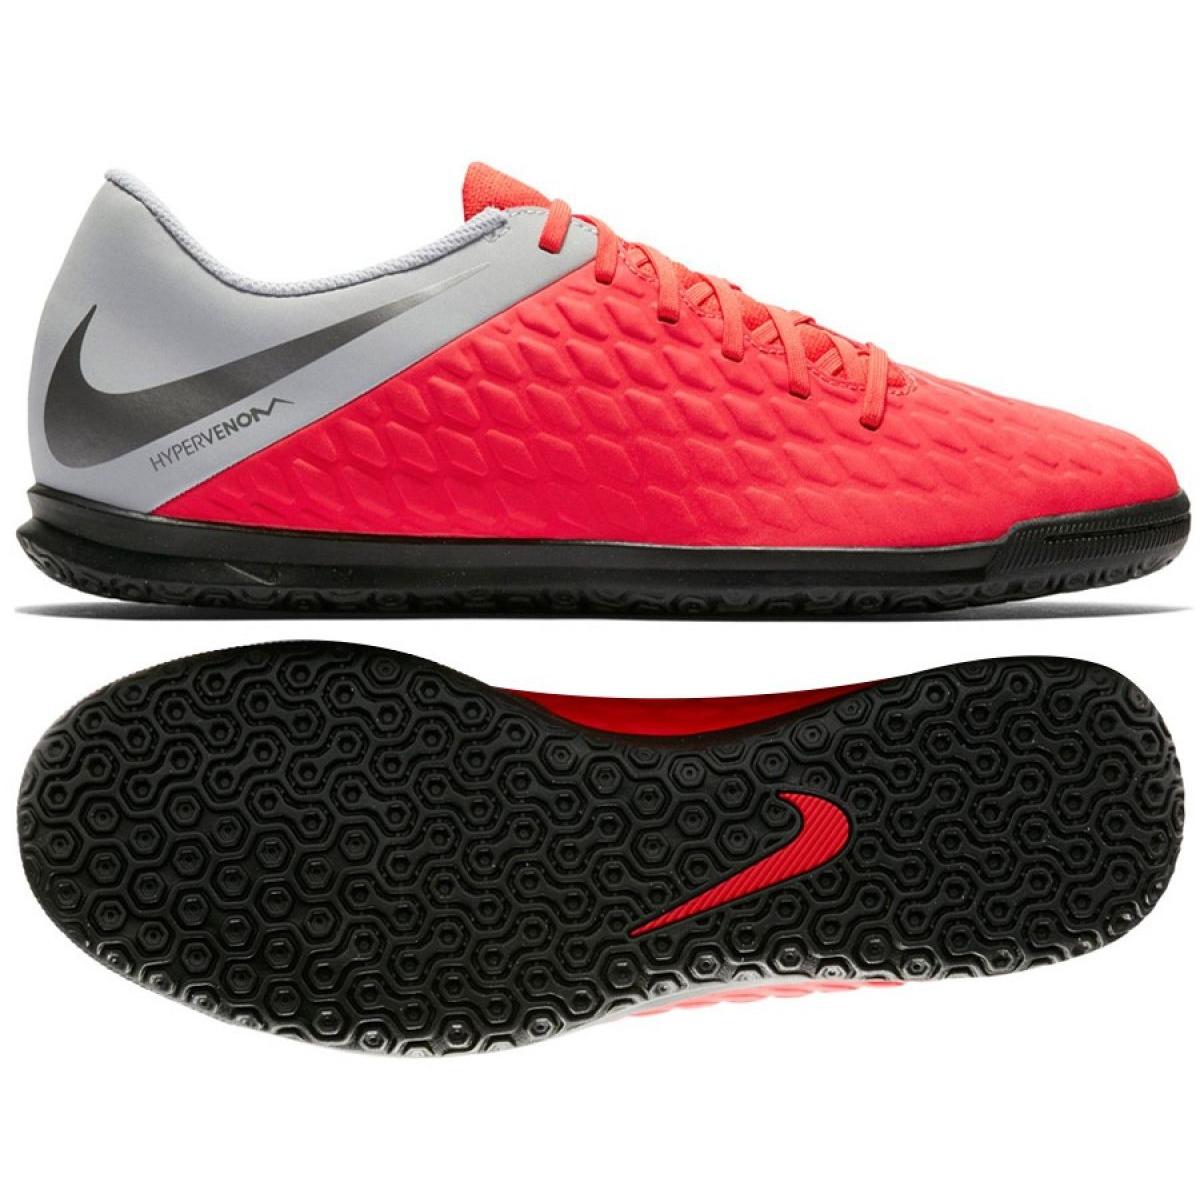 Hallenschuhe Nike Hypervenom Phantomx 3 Club Ic Jr Aj3789 600 Rot Rot